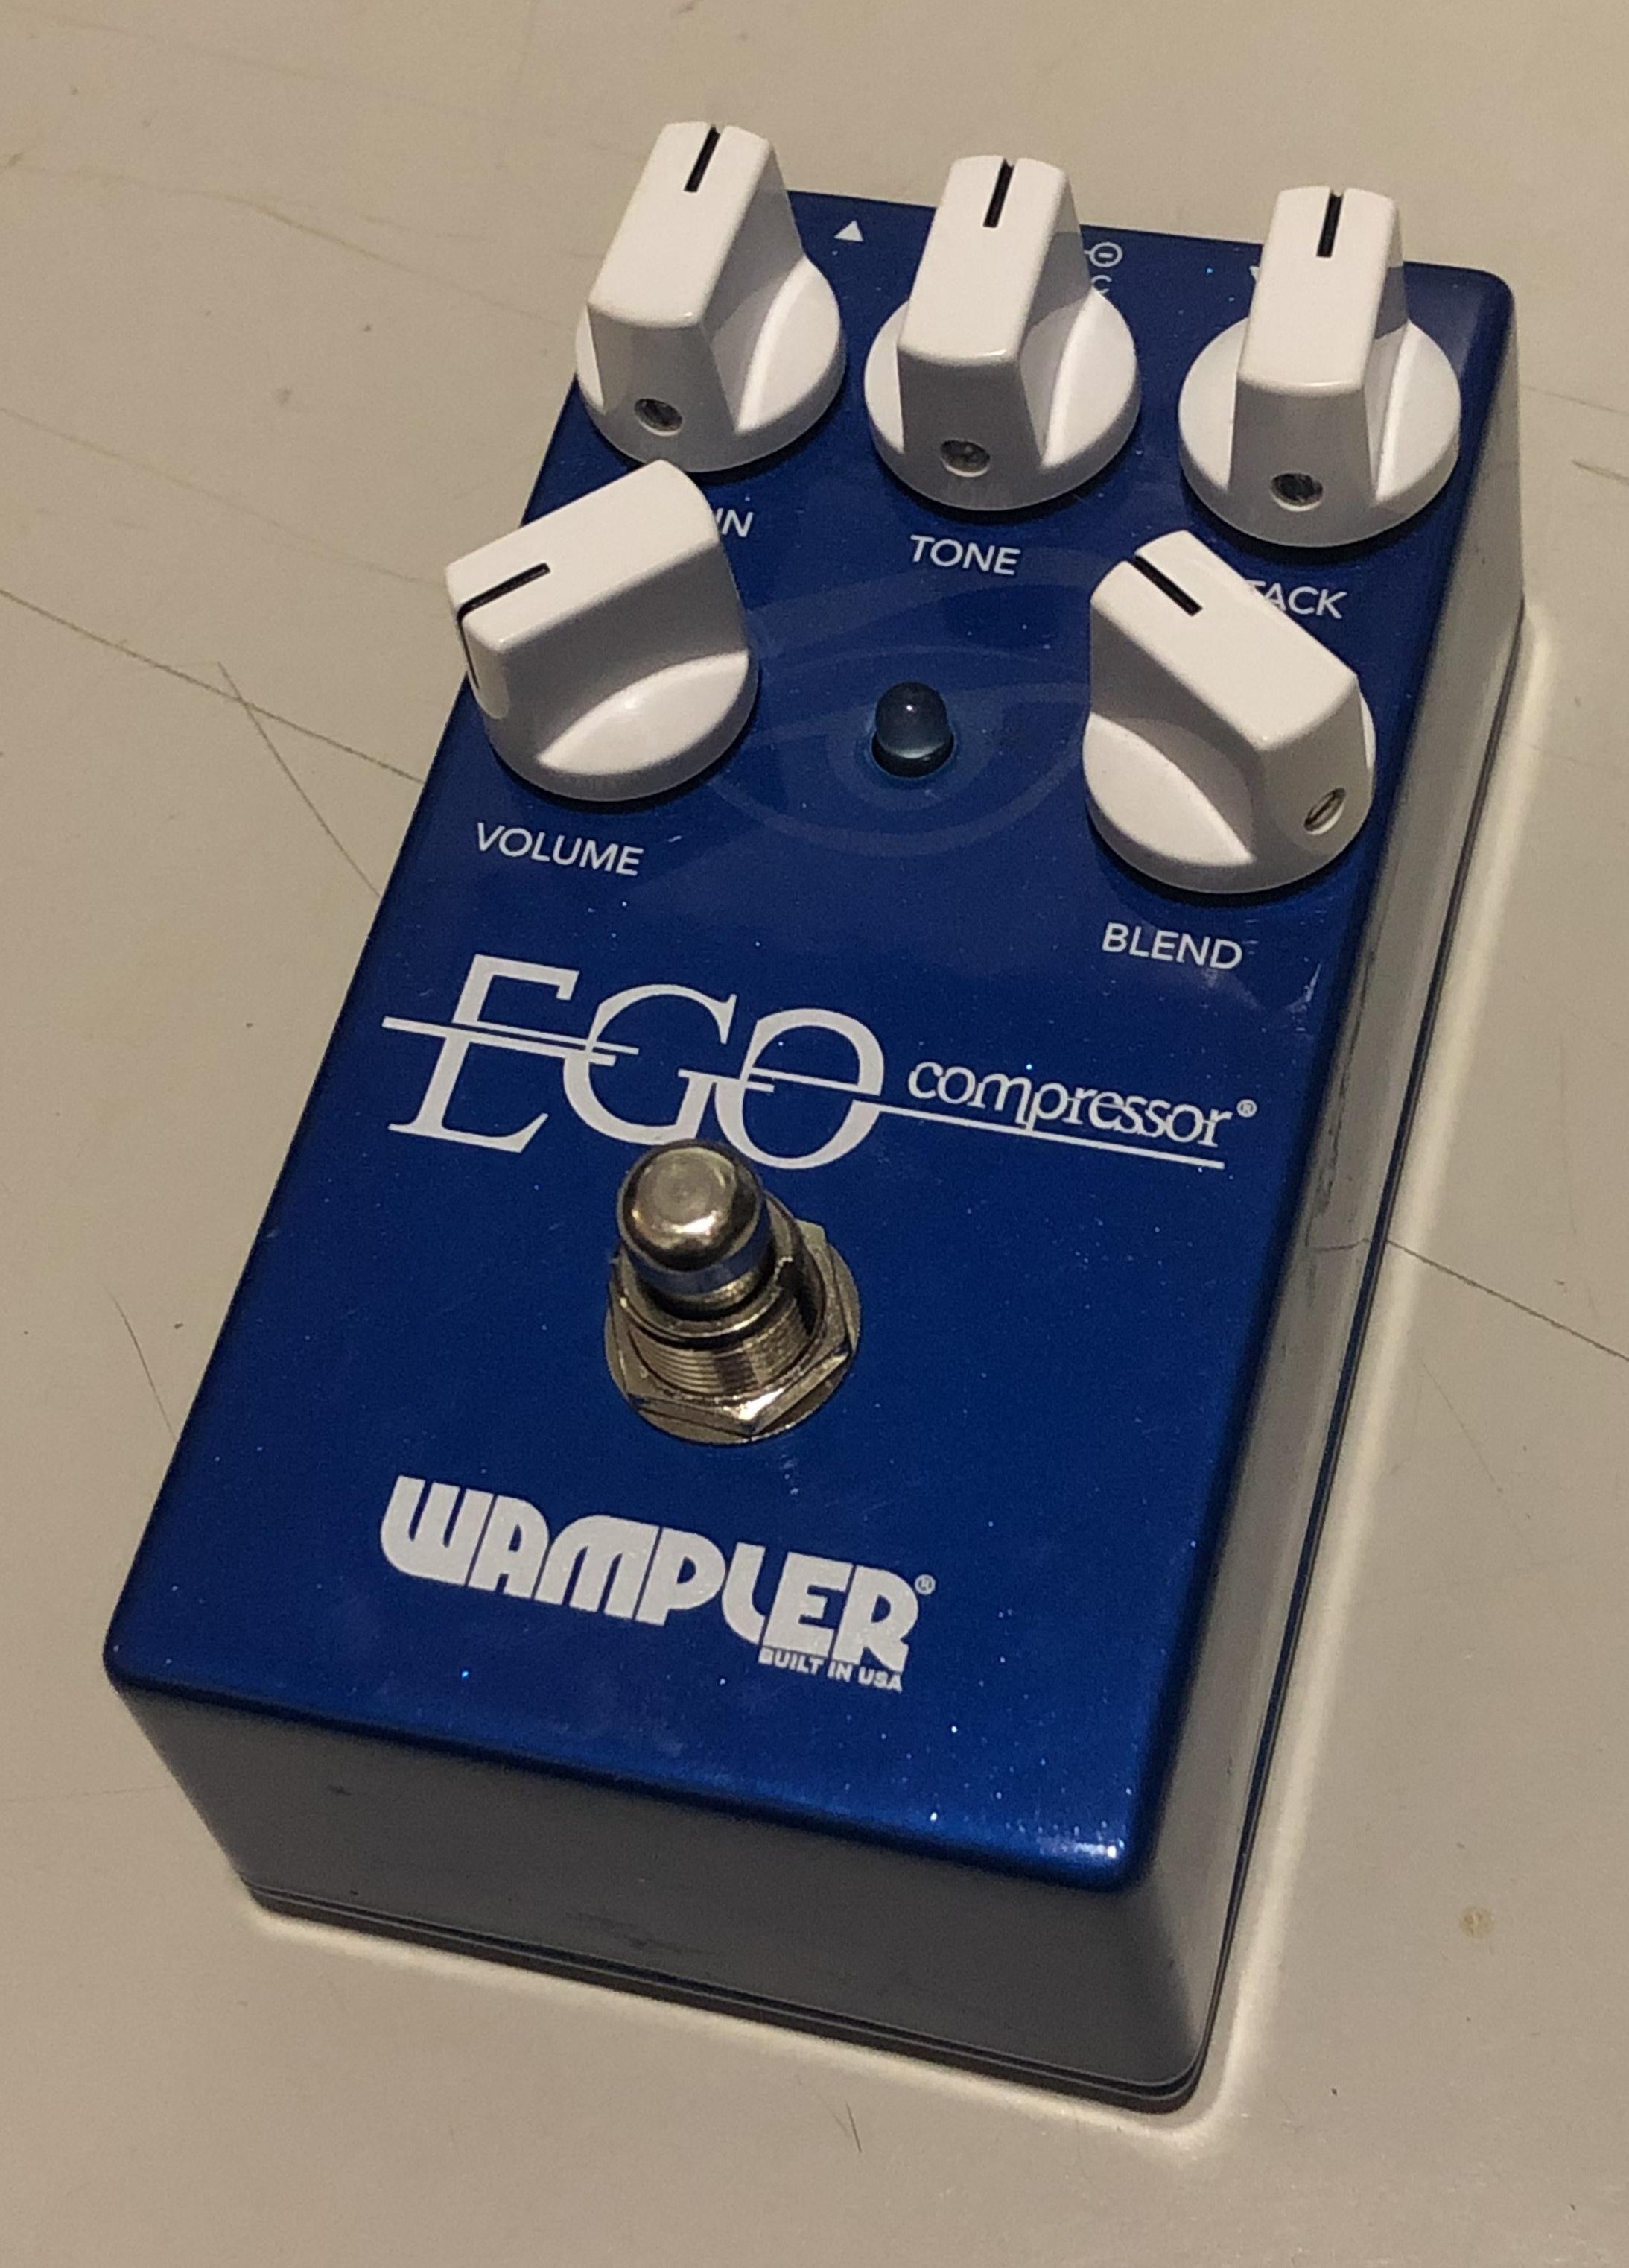 WAMPLER - Ego Compressor Pedal